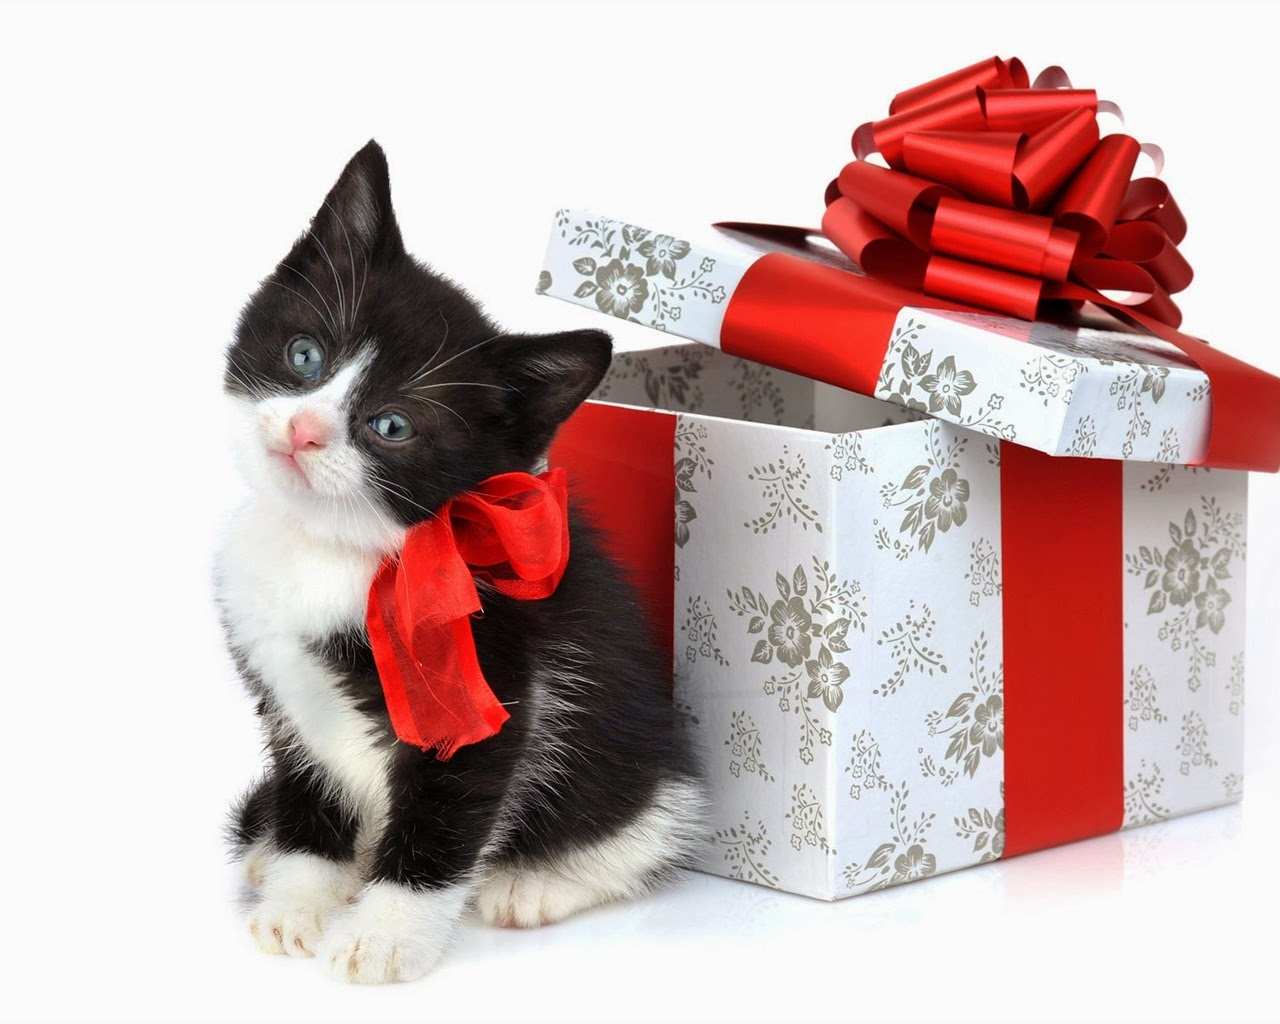 Cat Christmas gift wallpapers   beautiful desktop wallpapers 2014 1280x1024